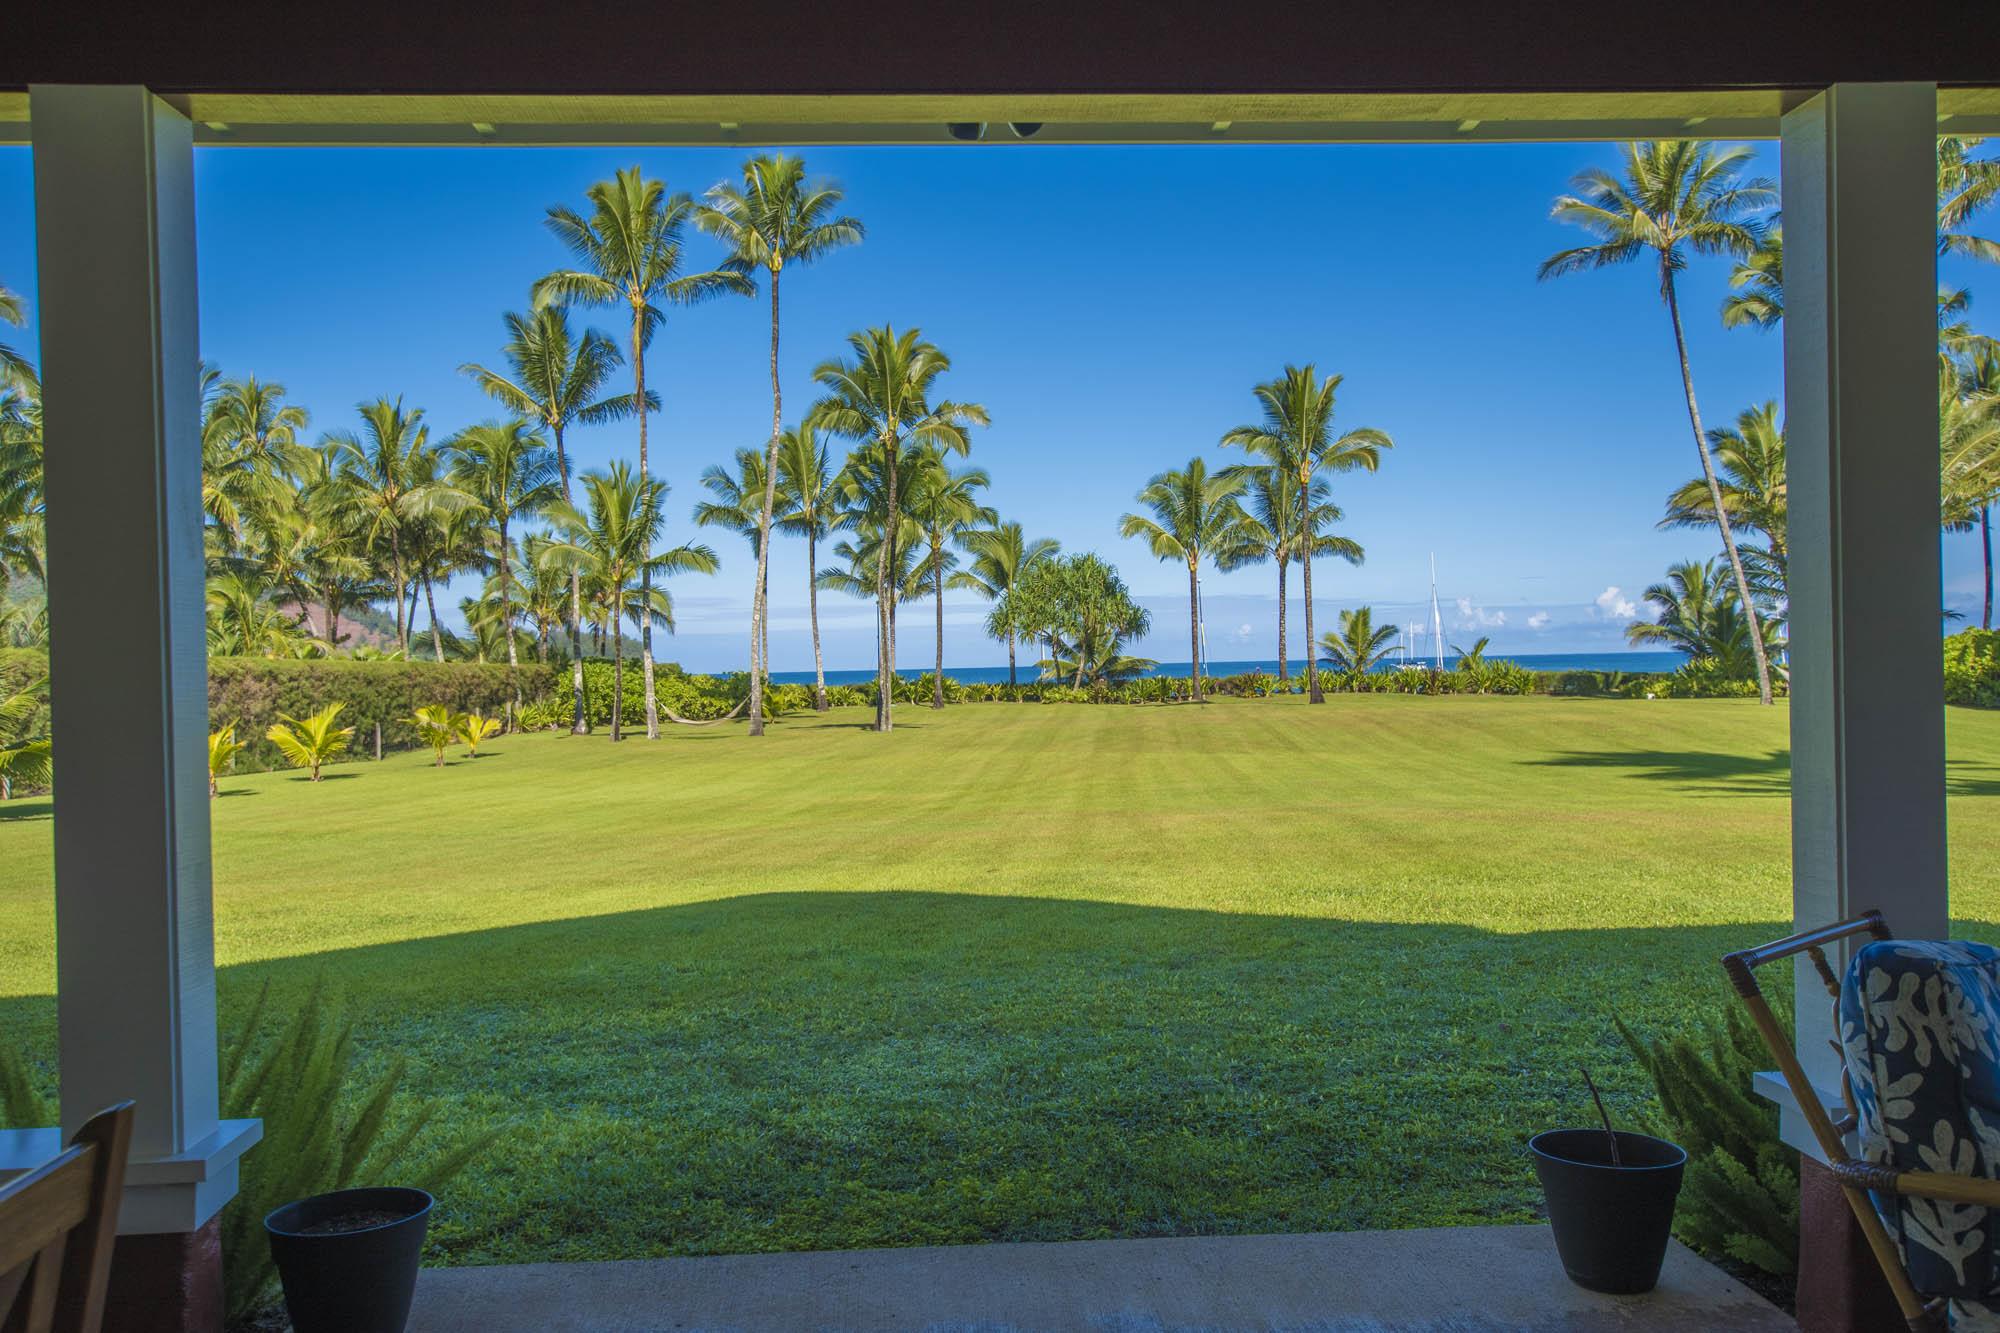 Kauai-217-Hanalei Bay46